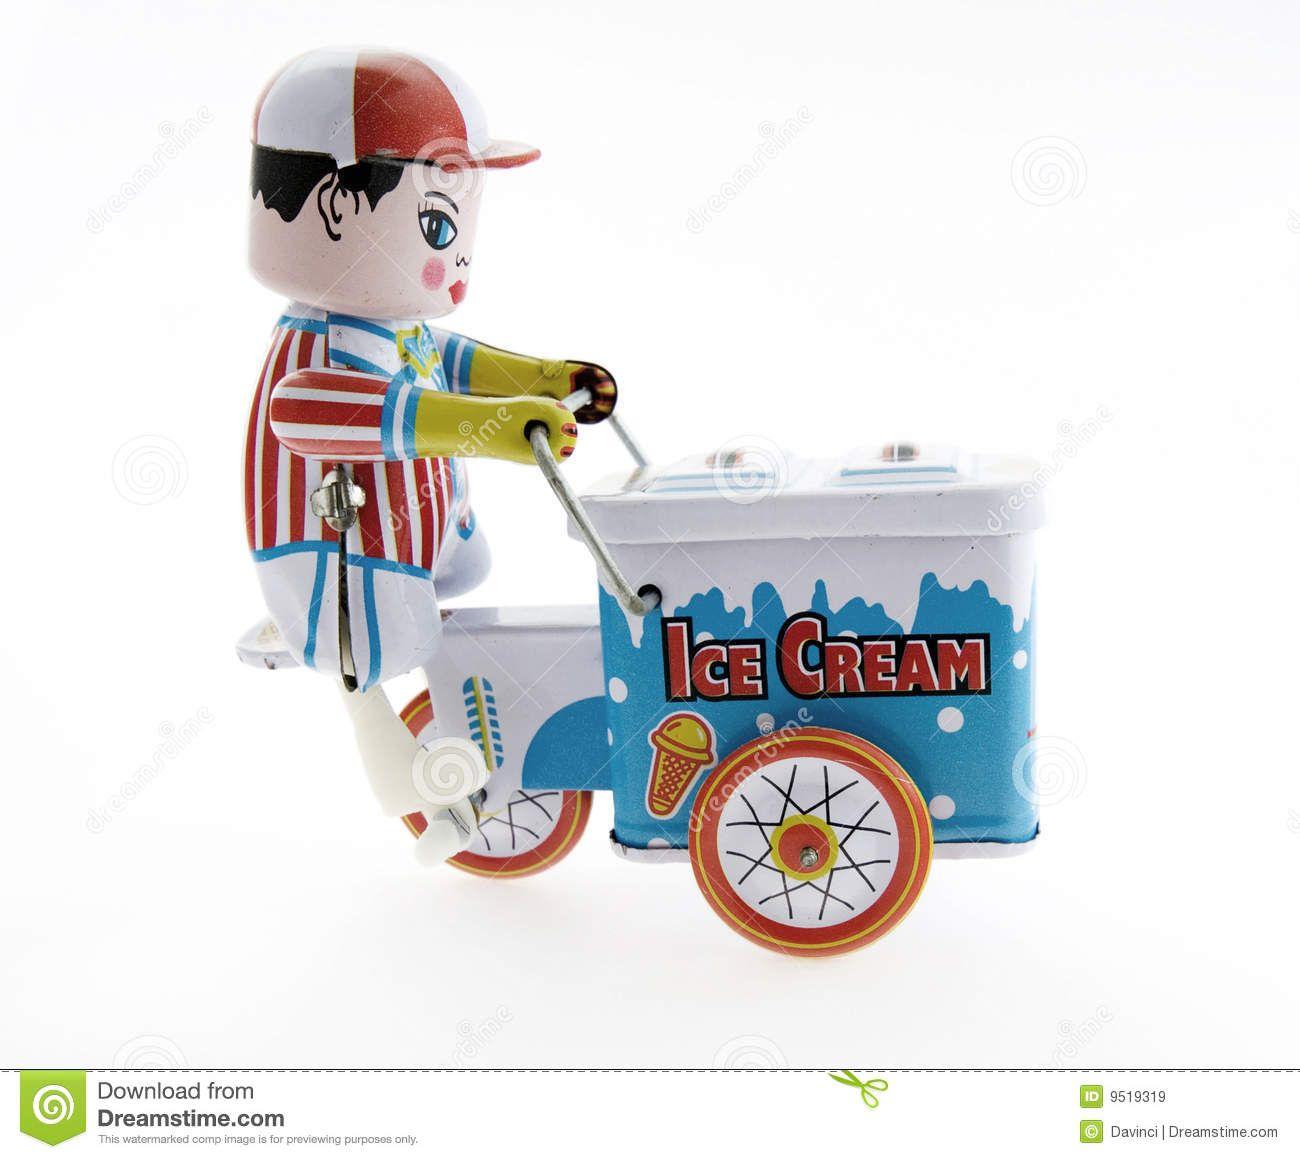 icecream-9519319.jpg (1300×1159)